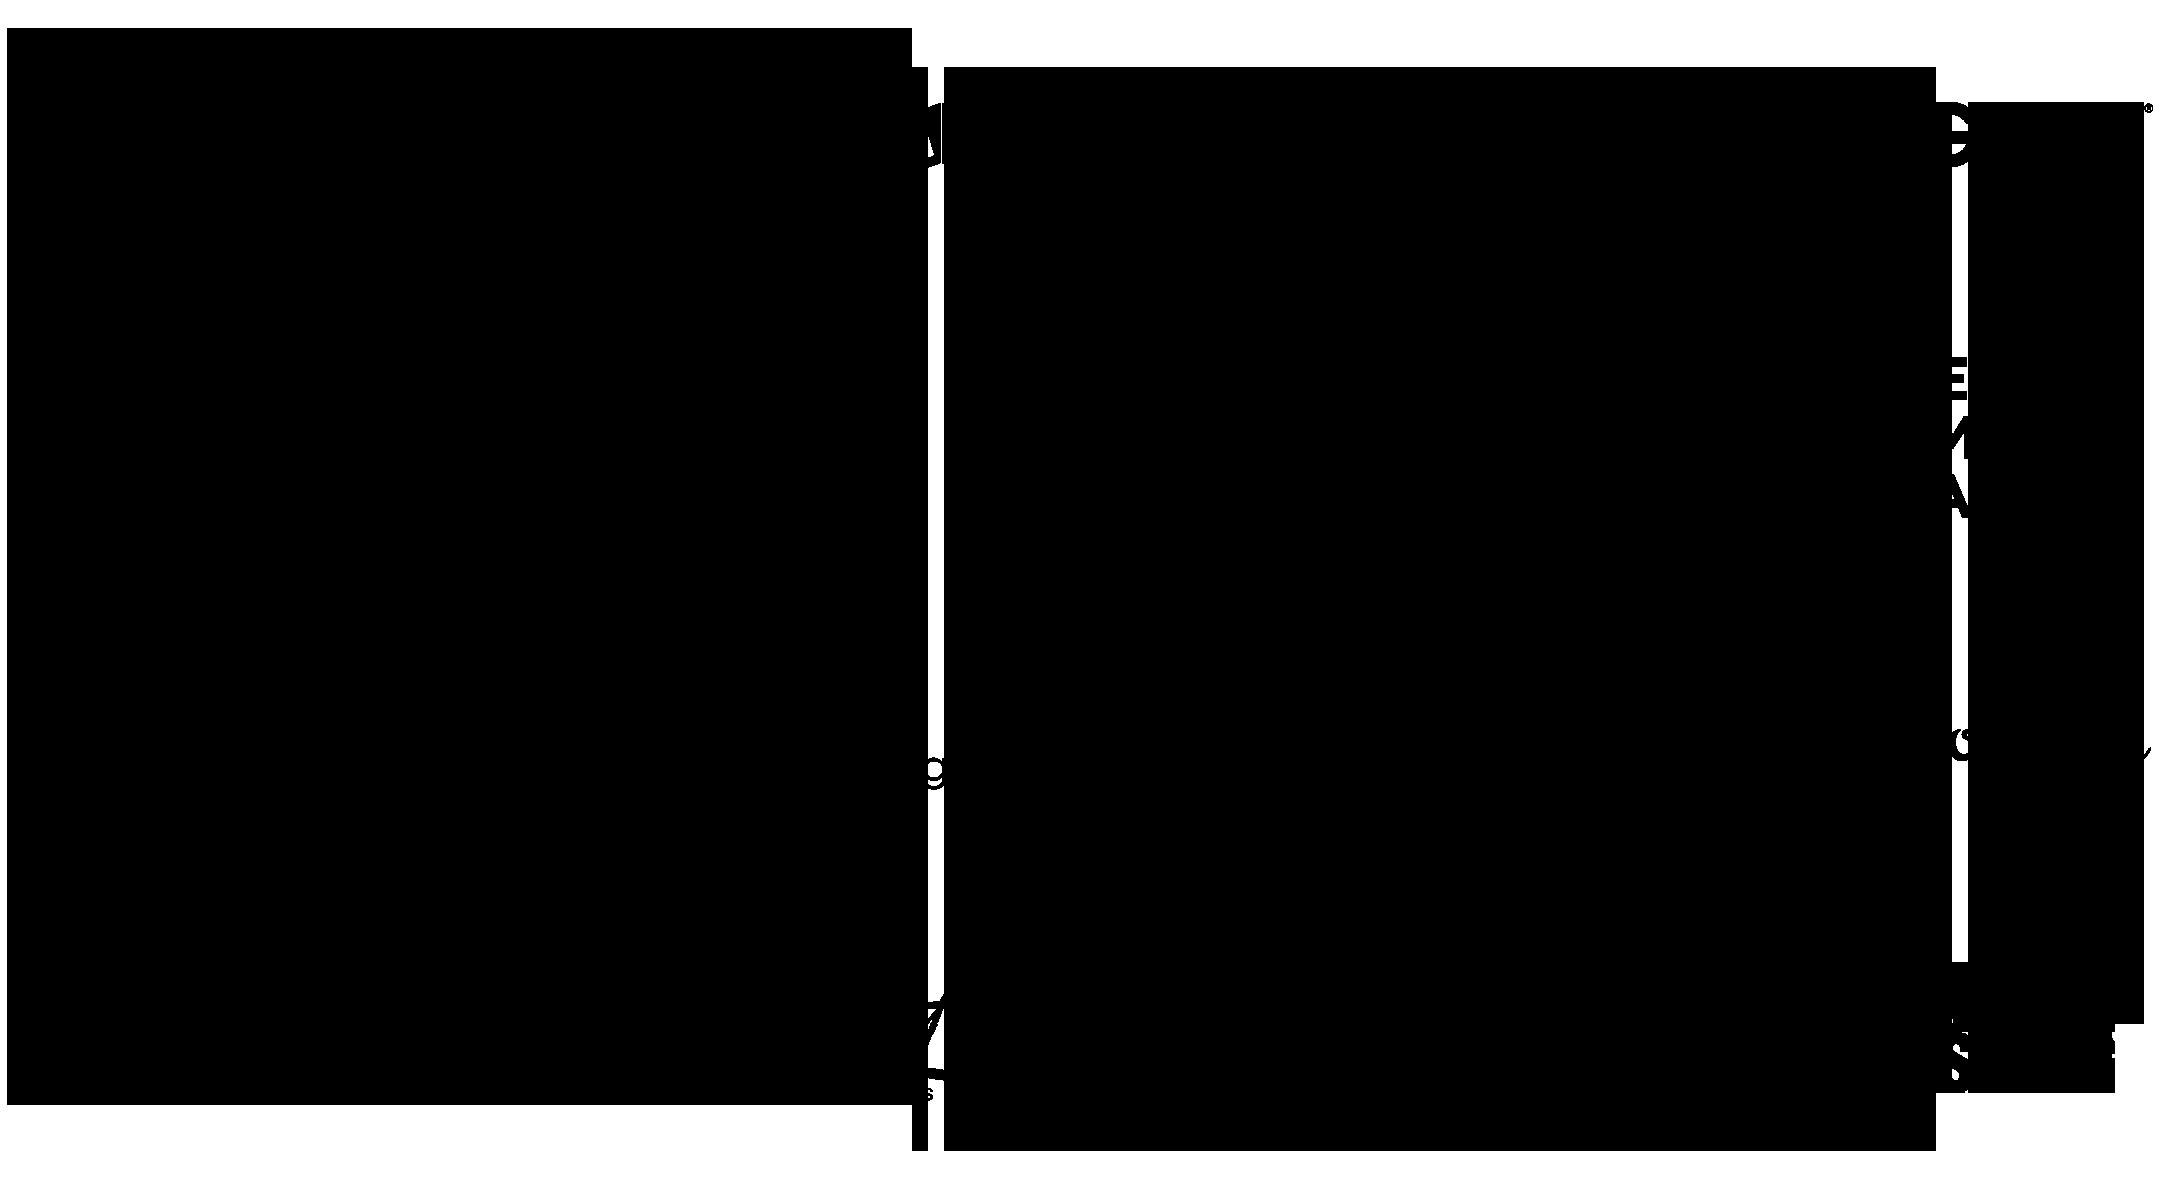 ClientLogoGrid_Horizontal_MASTER_02_20190515